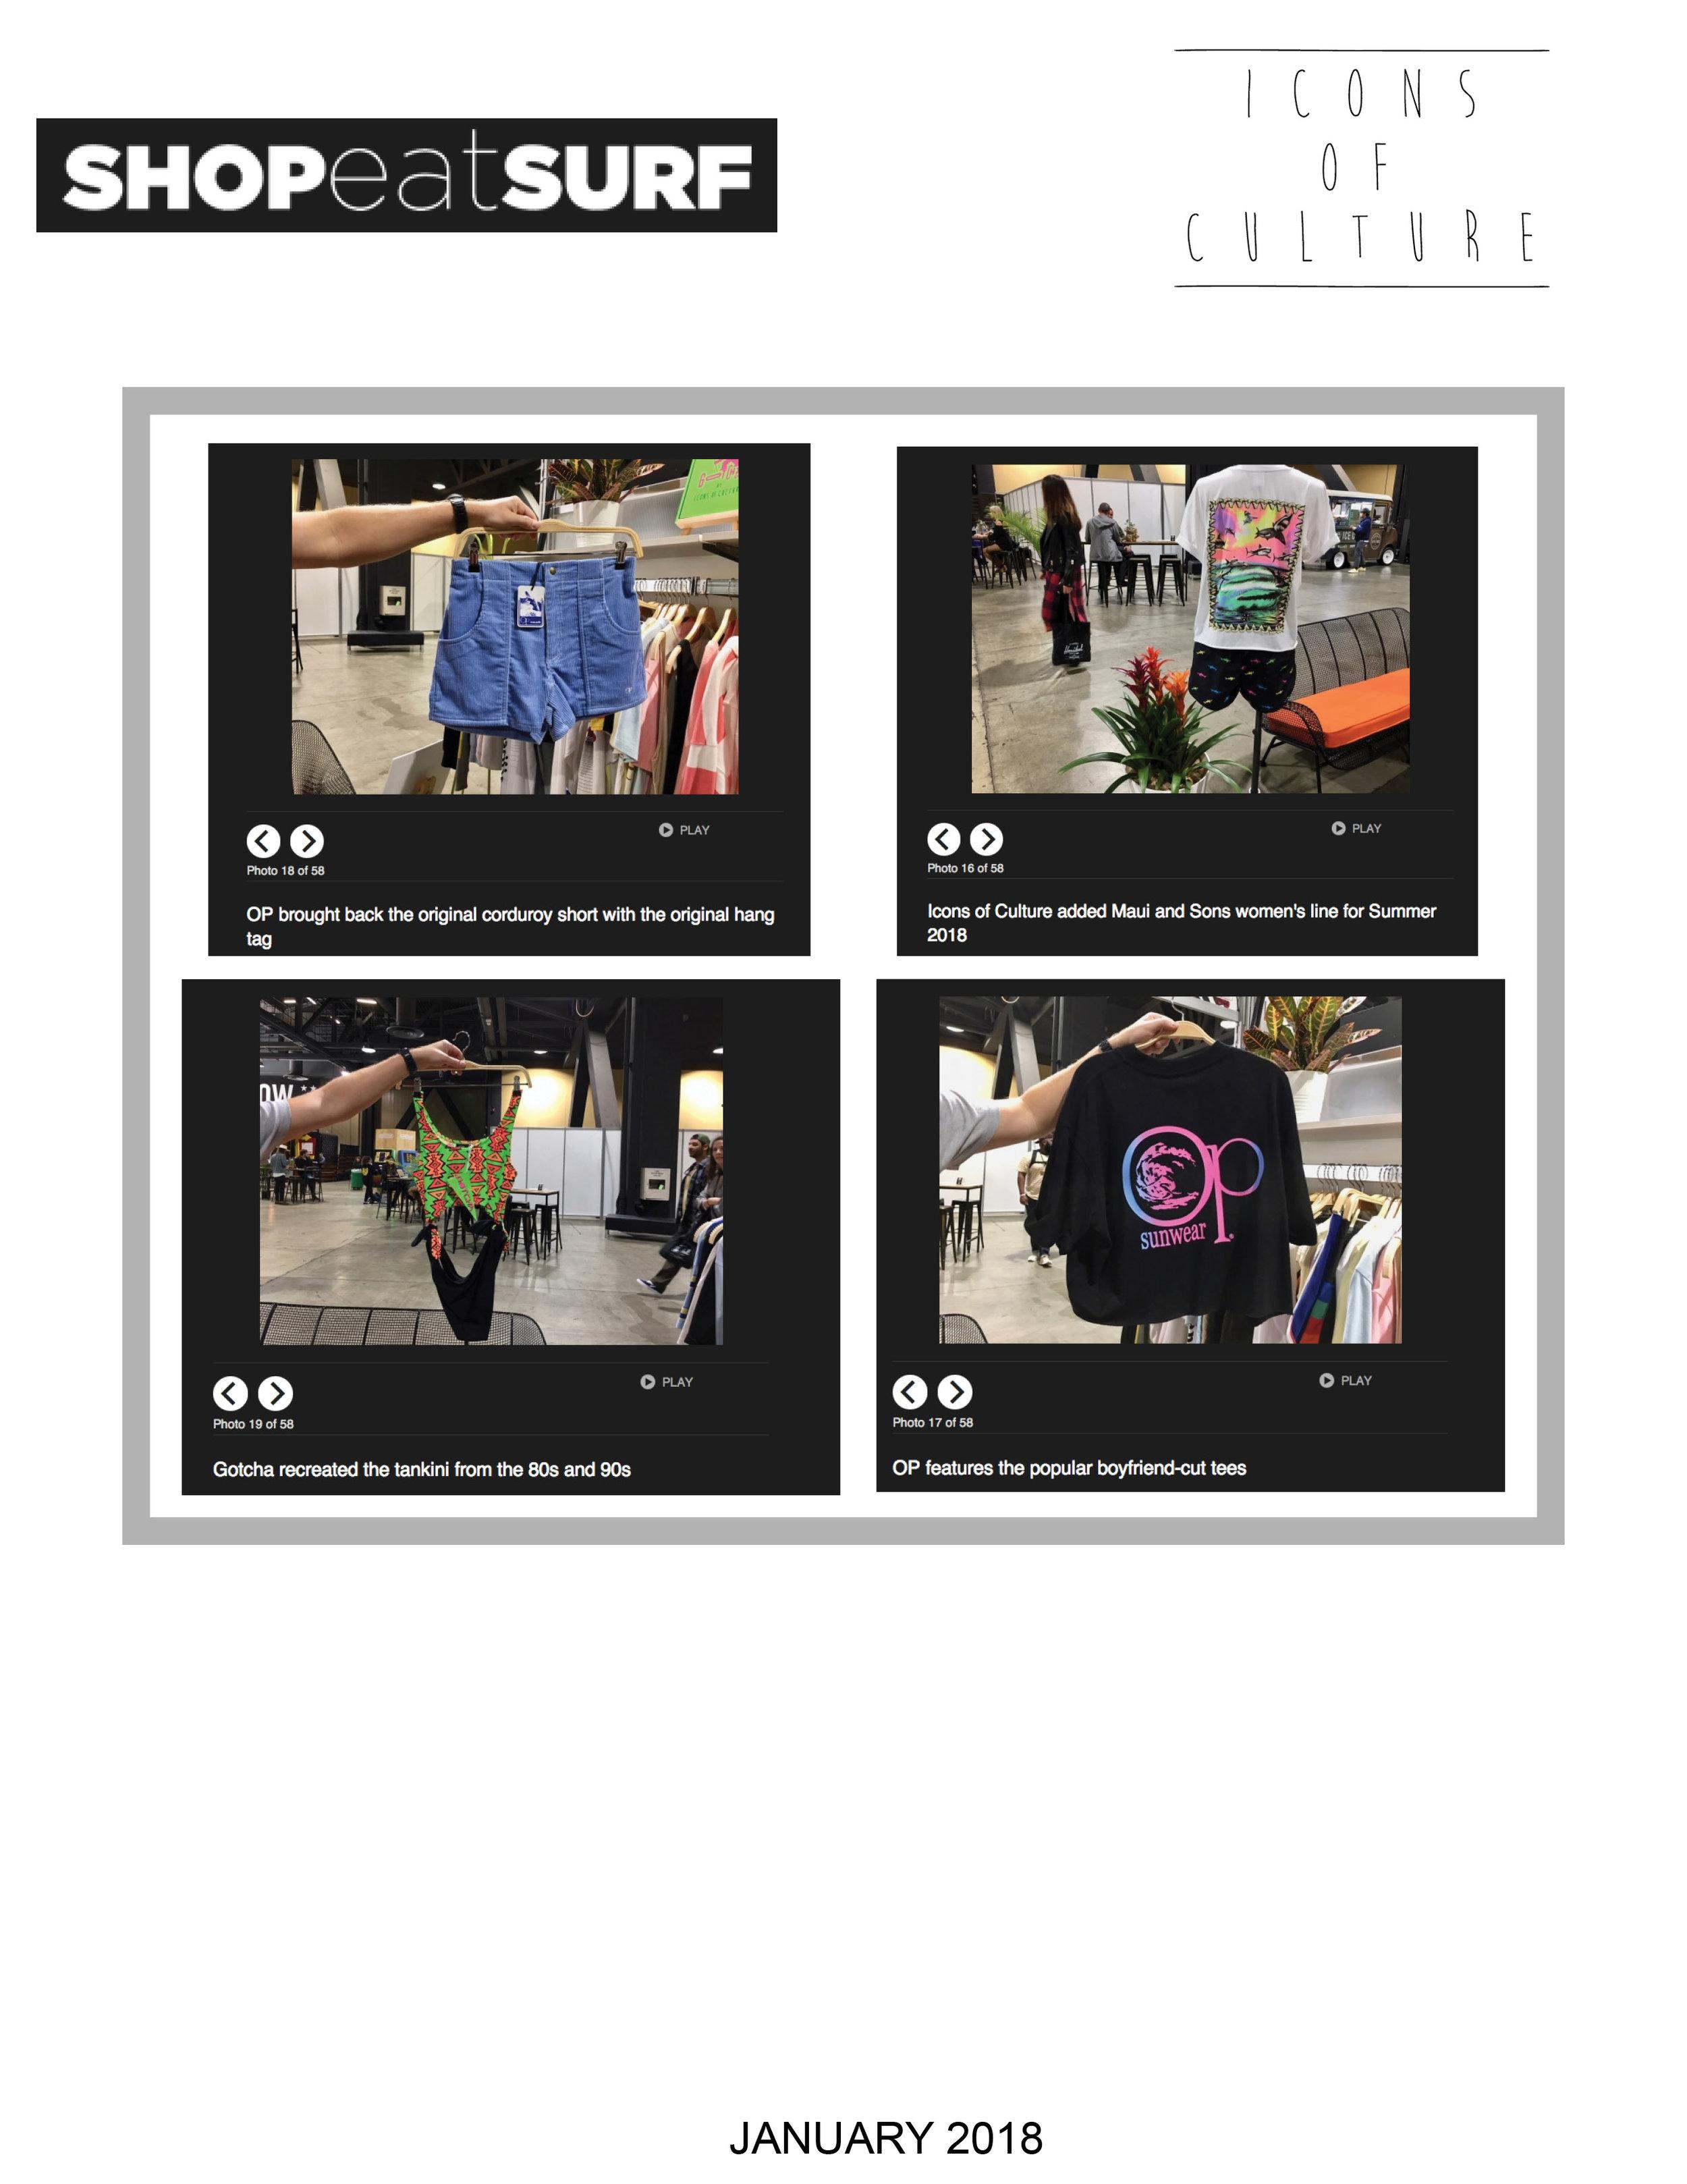 IconsOfCulture_ShopEatSurf_January2018.jpg